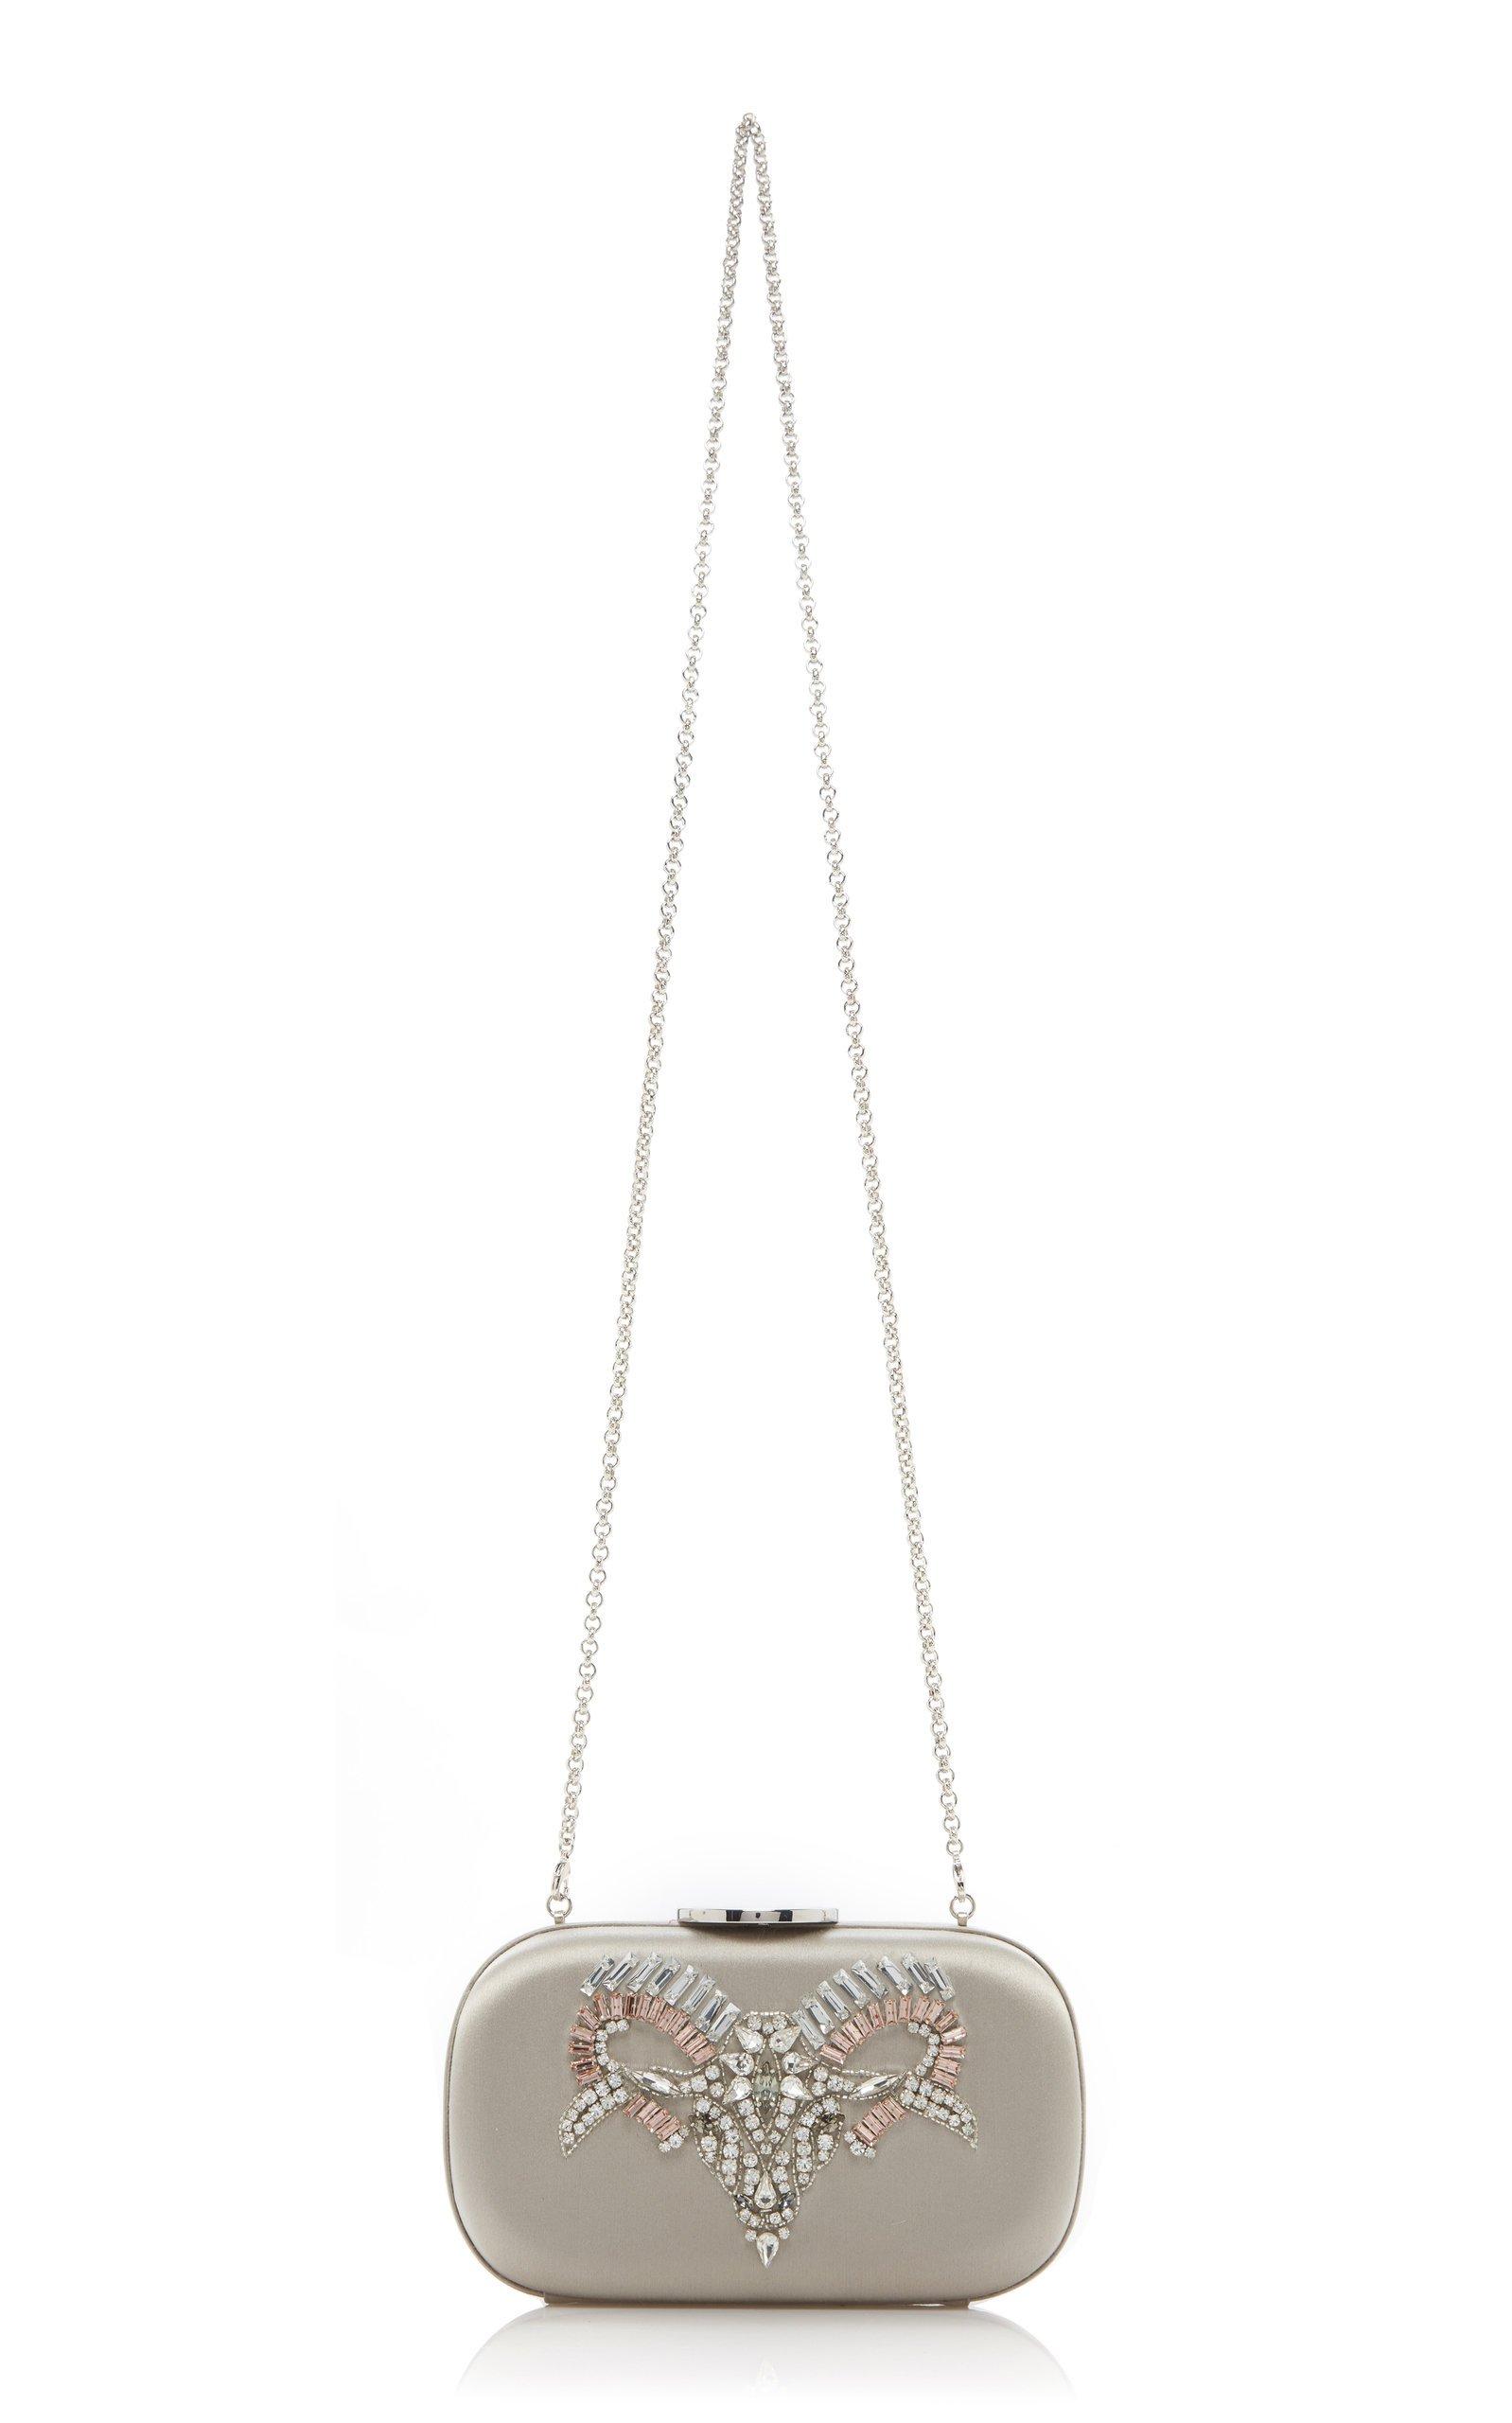 Embellished Satin Clutch by Giambattista Valli | Moda Operandi